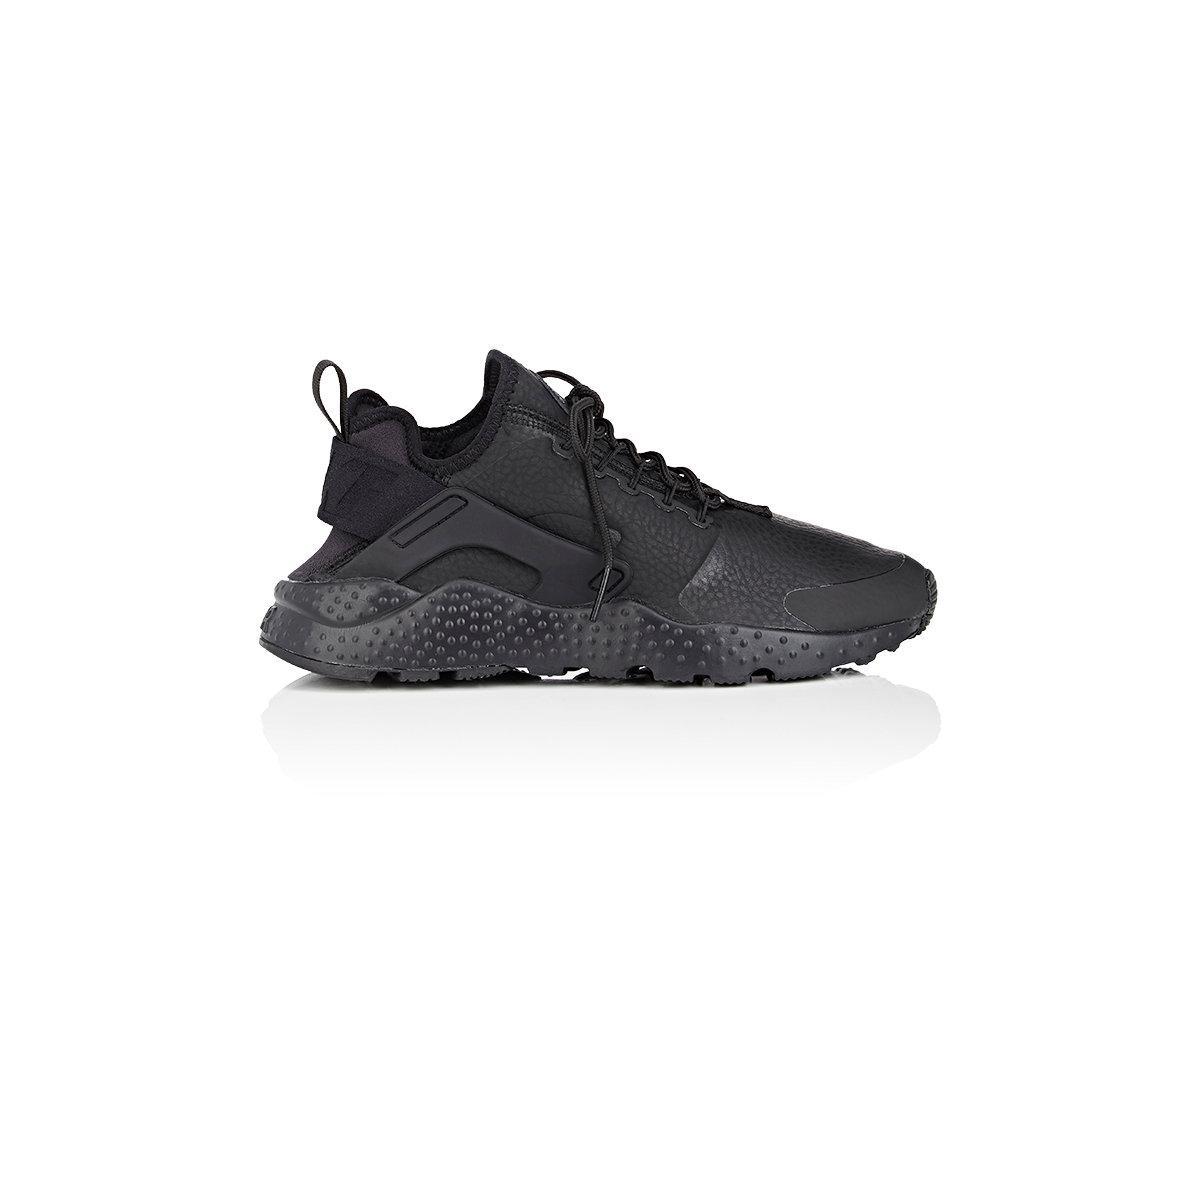 Gallery. Previously sold at: Barneys New York, Barneys Warehouse · Men's  Running Sneakers Men's Nike Huarache